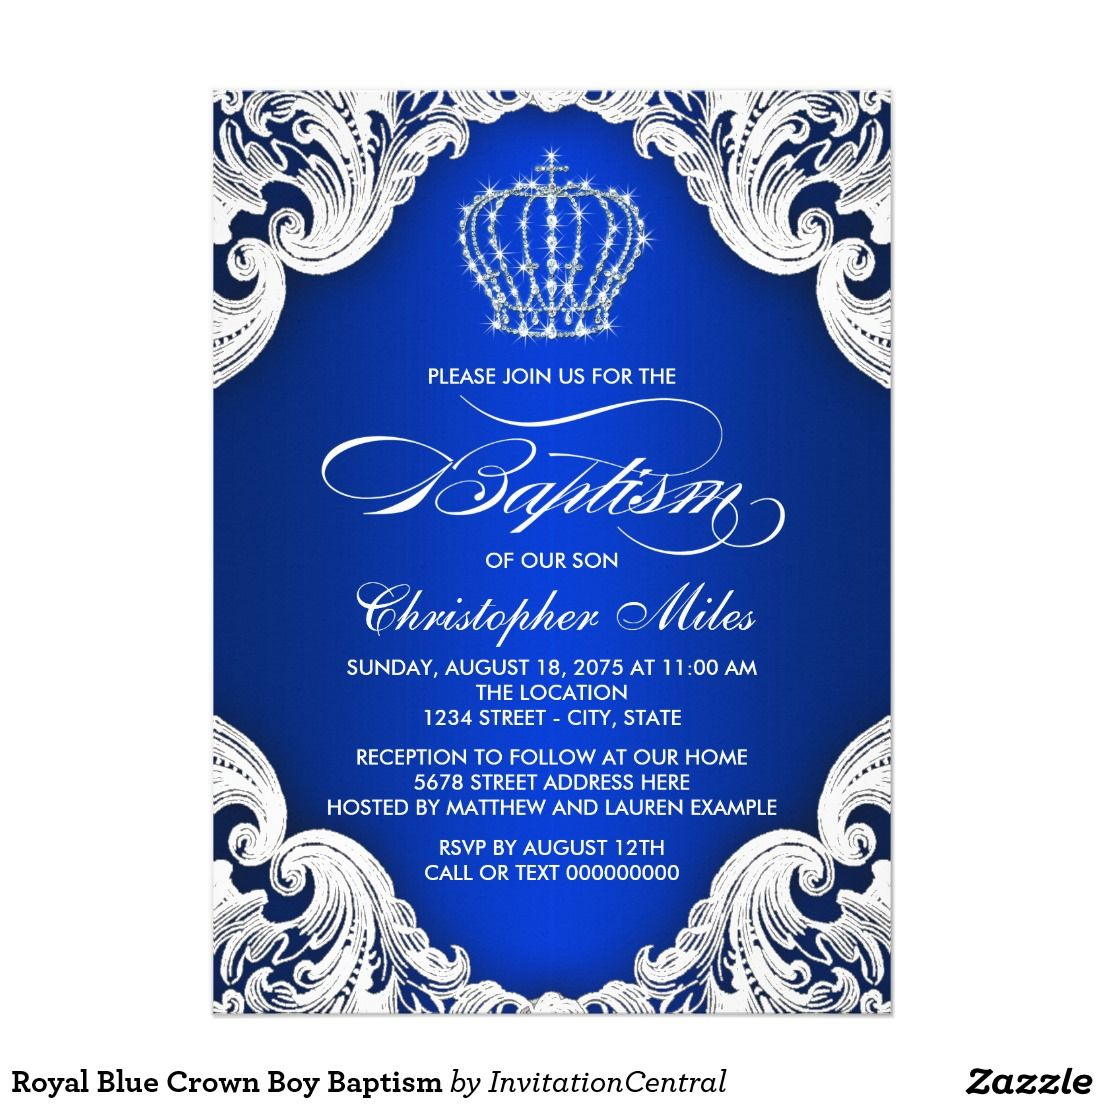 Royal Blue Crown Boy Baptism Invitation Zazzle Com